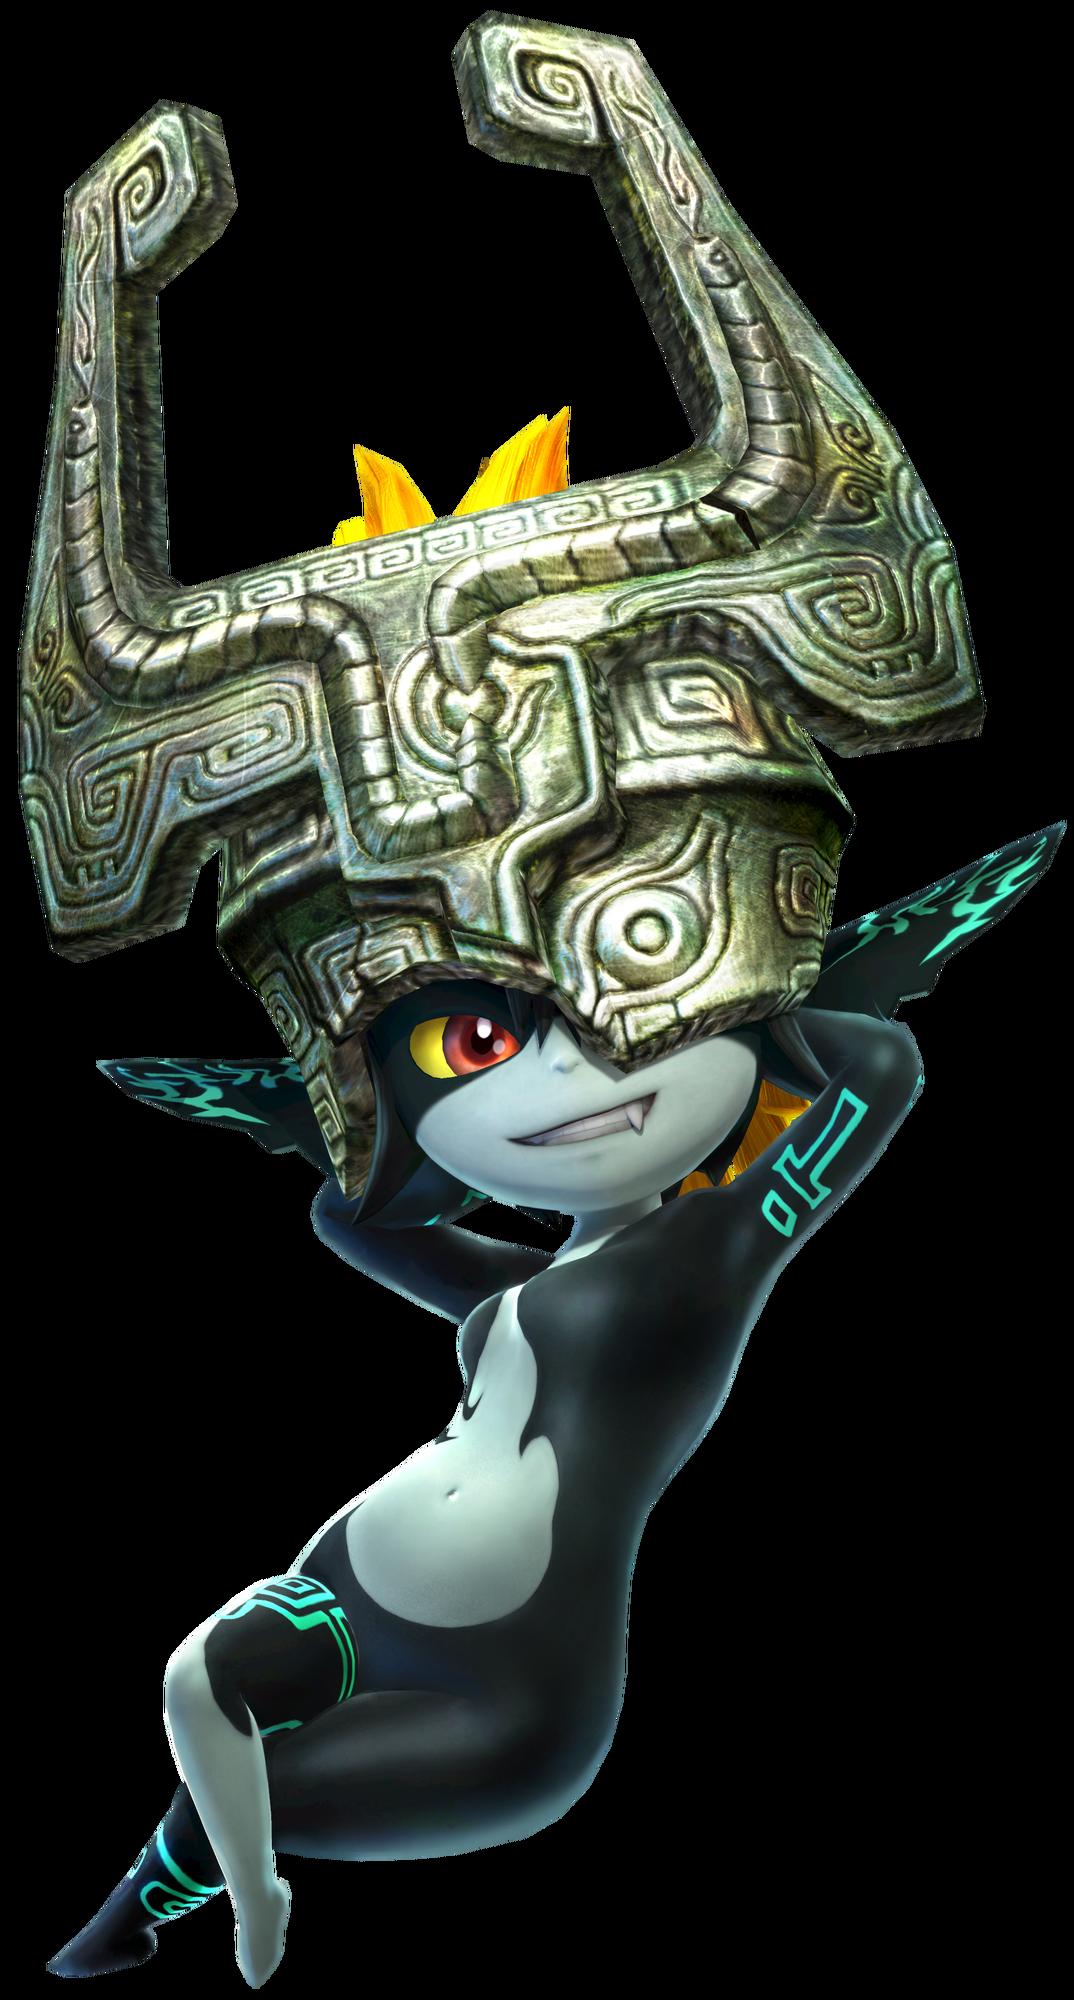 Midna/Hyrule Warriors | Zeldapedia | FANDOM powered by Wikia